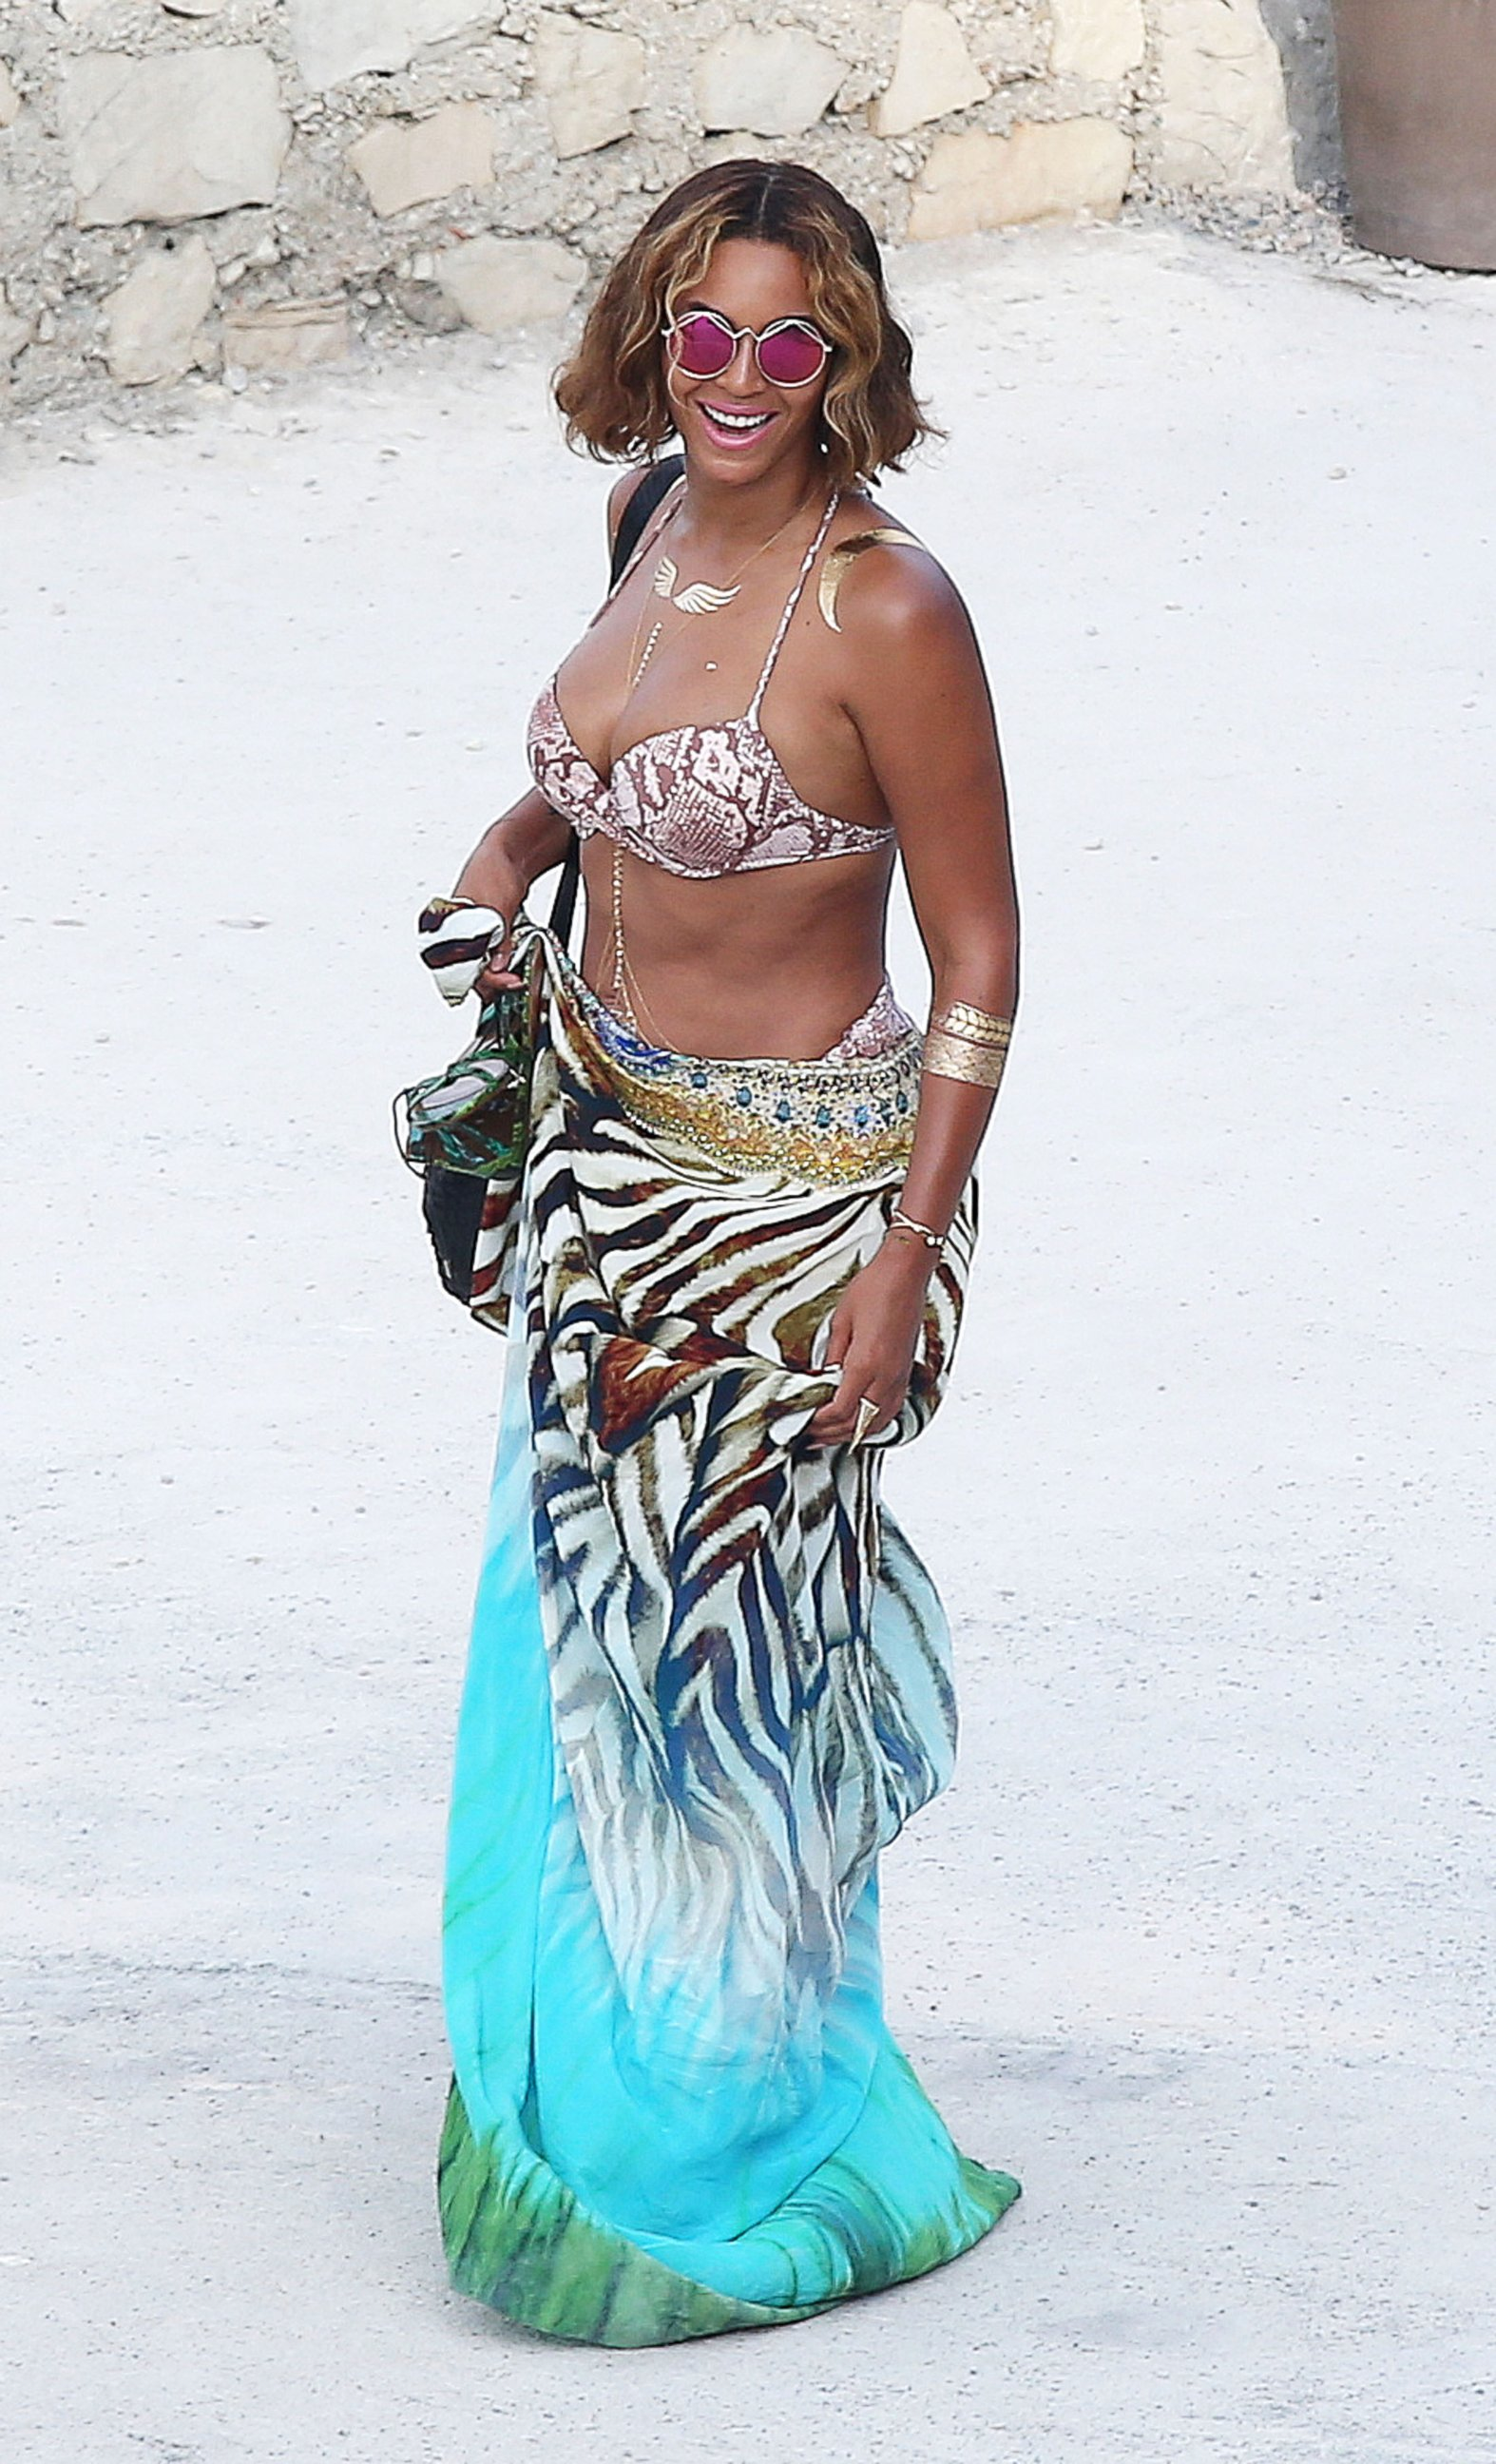 Beyonce Looks Sasha Fierce on the Beach